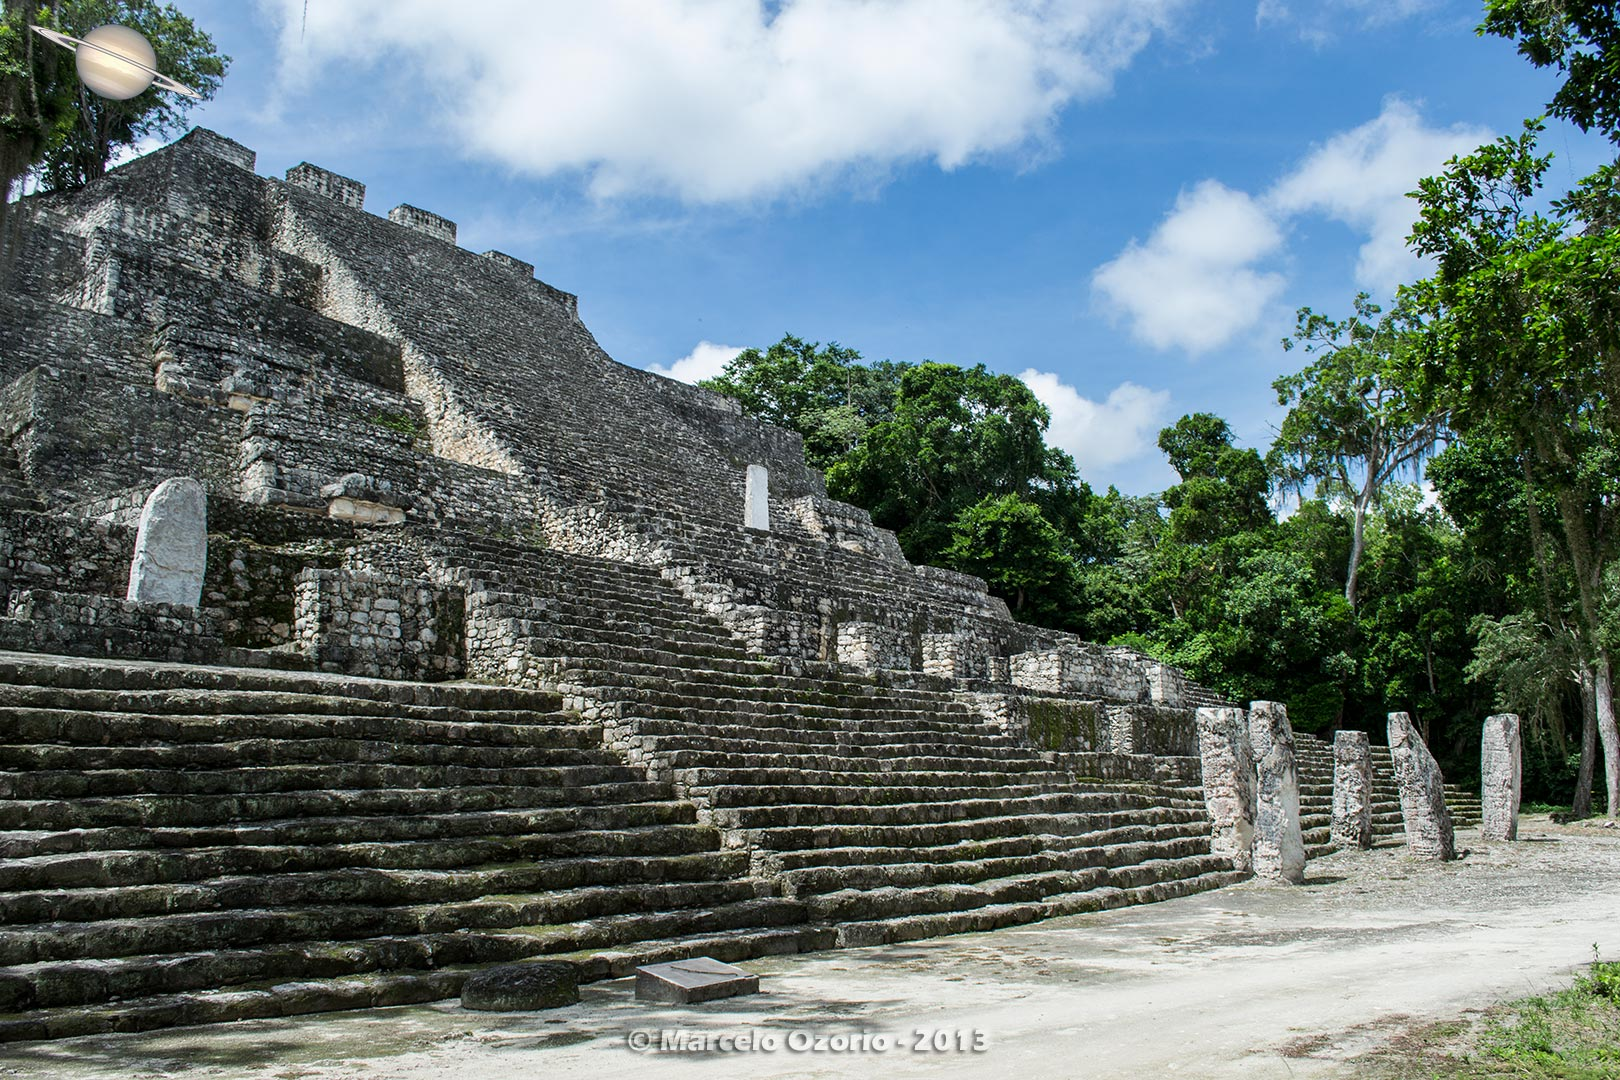 calakmul mayan civilization mexico 38 - Calakmul, City of the Two Adjacent Pyramids - Mexico